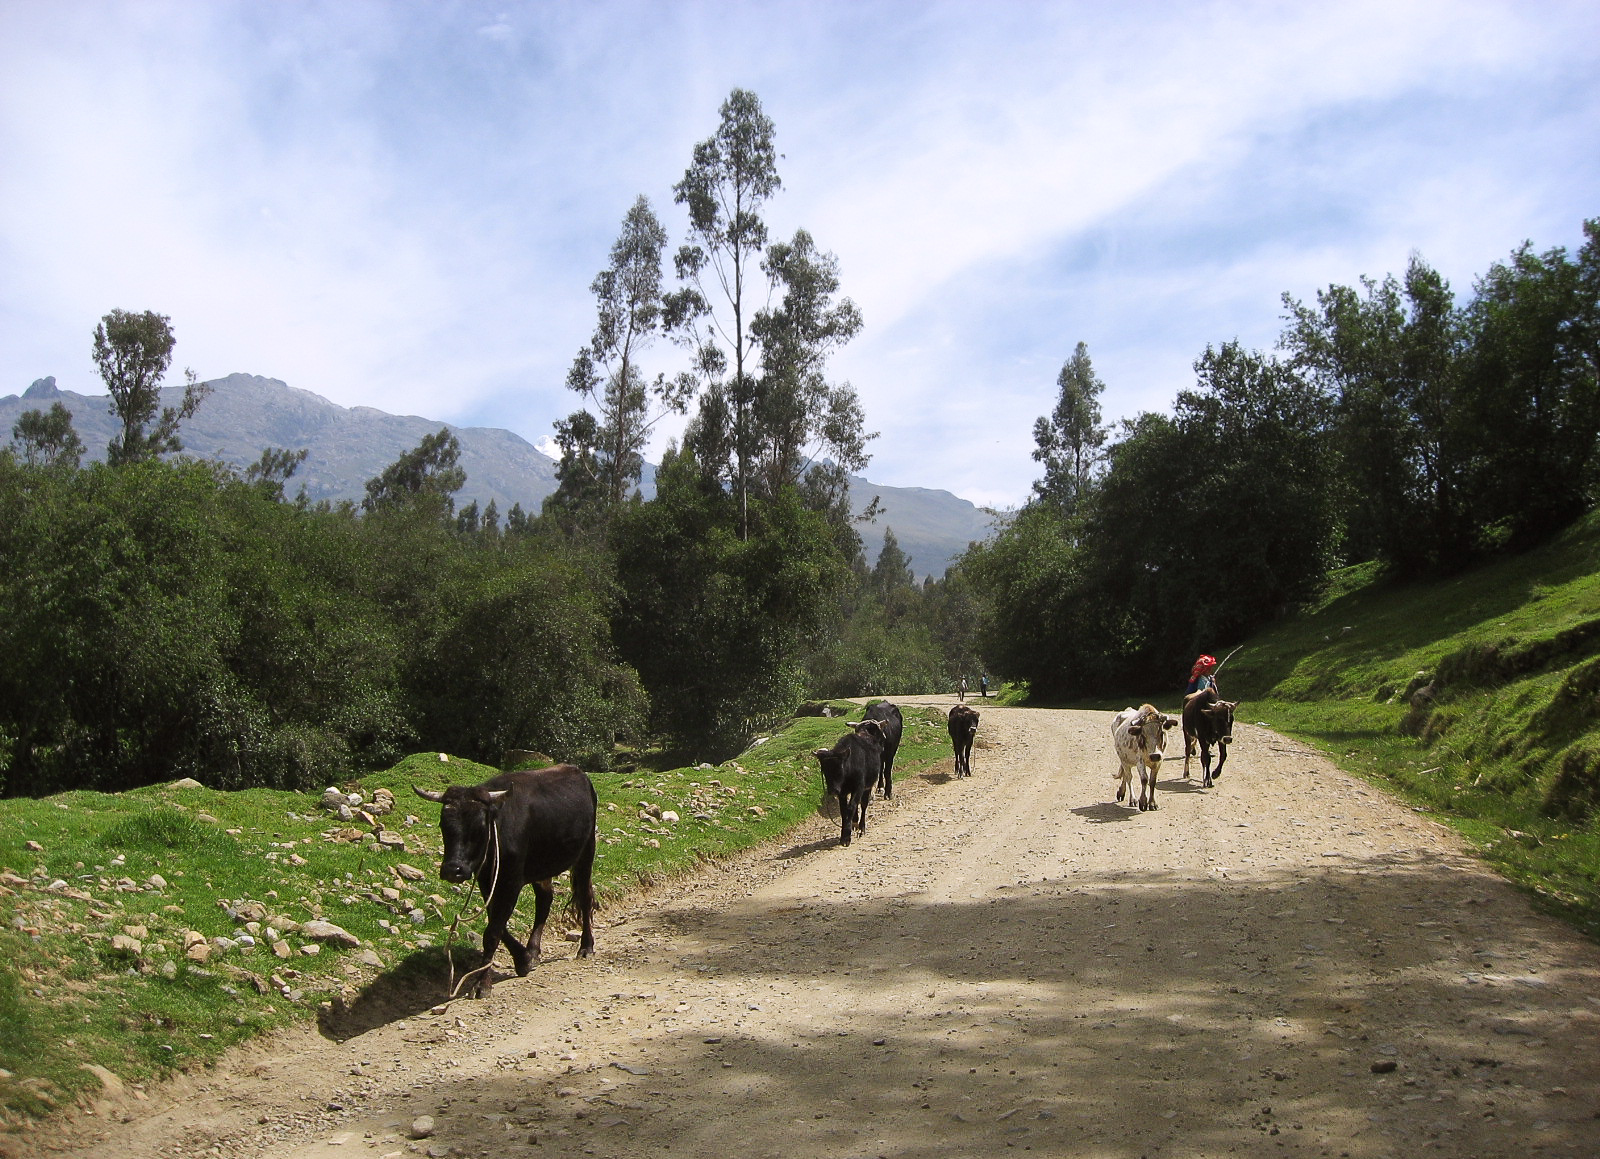 huaraz_ruins_and_walk-to-866-bulls-on-dirt-road.jpg